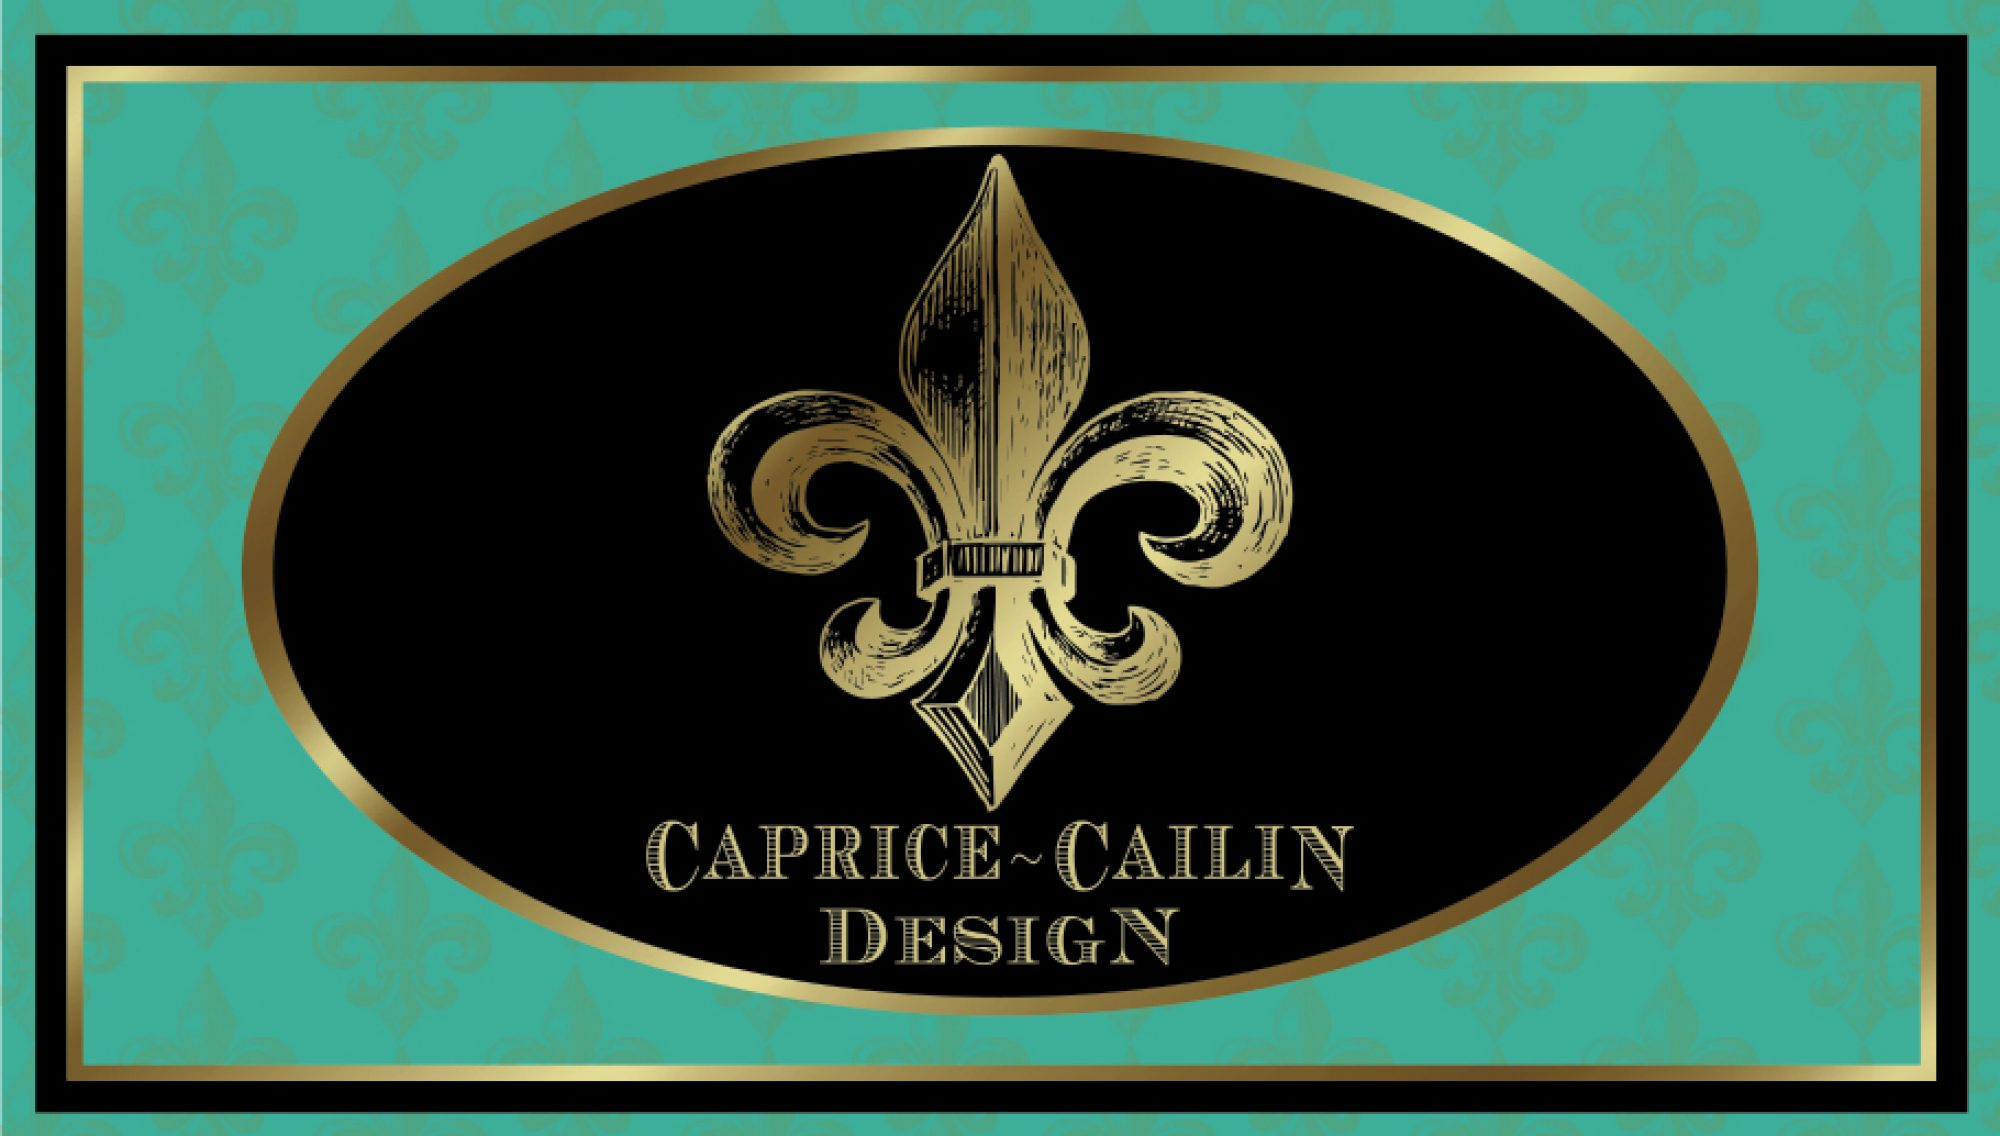 Caprice~Cailin Design